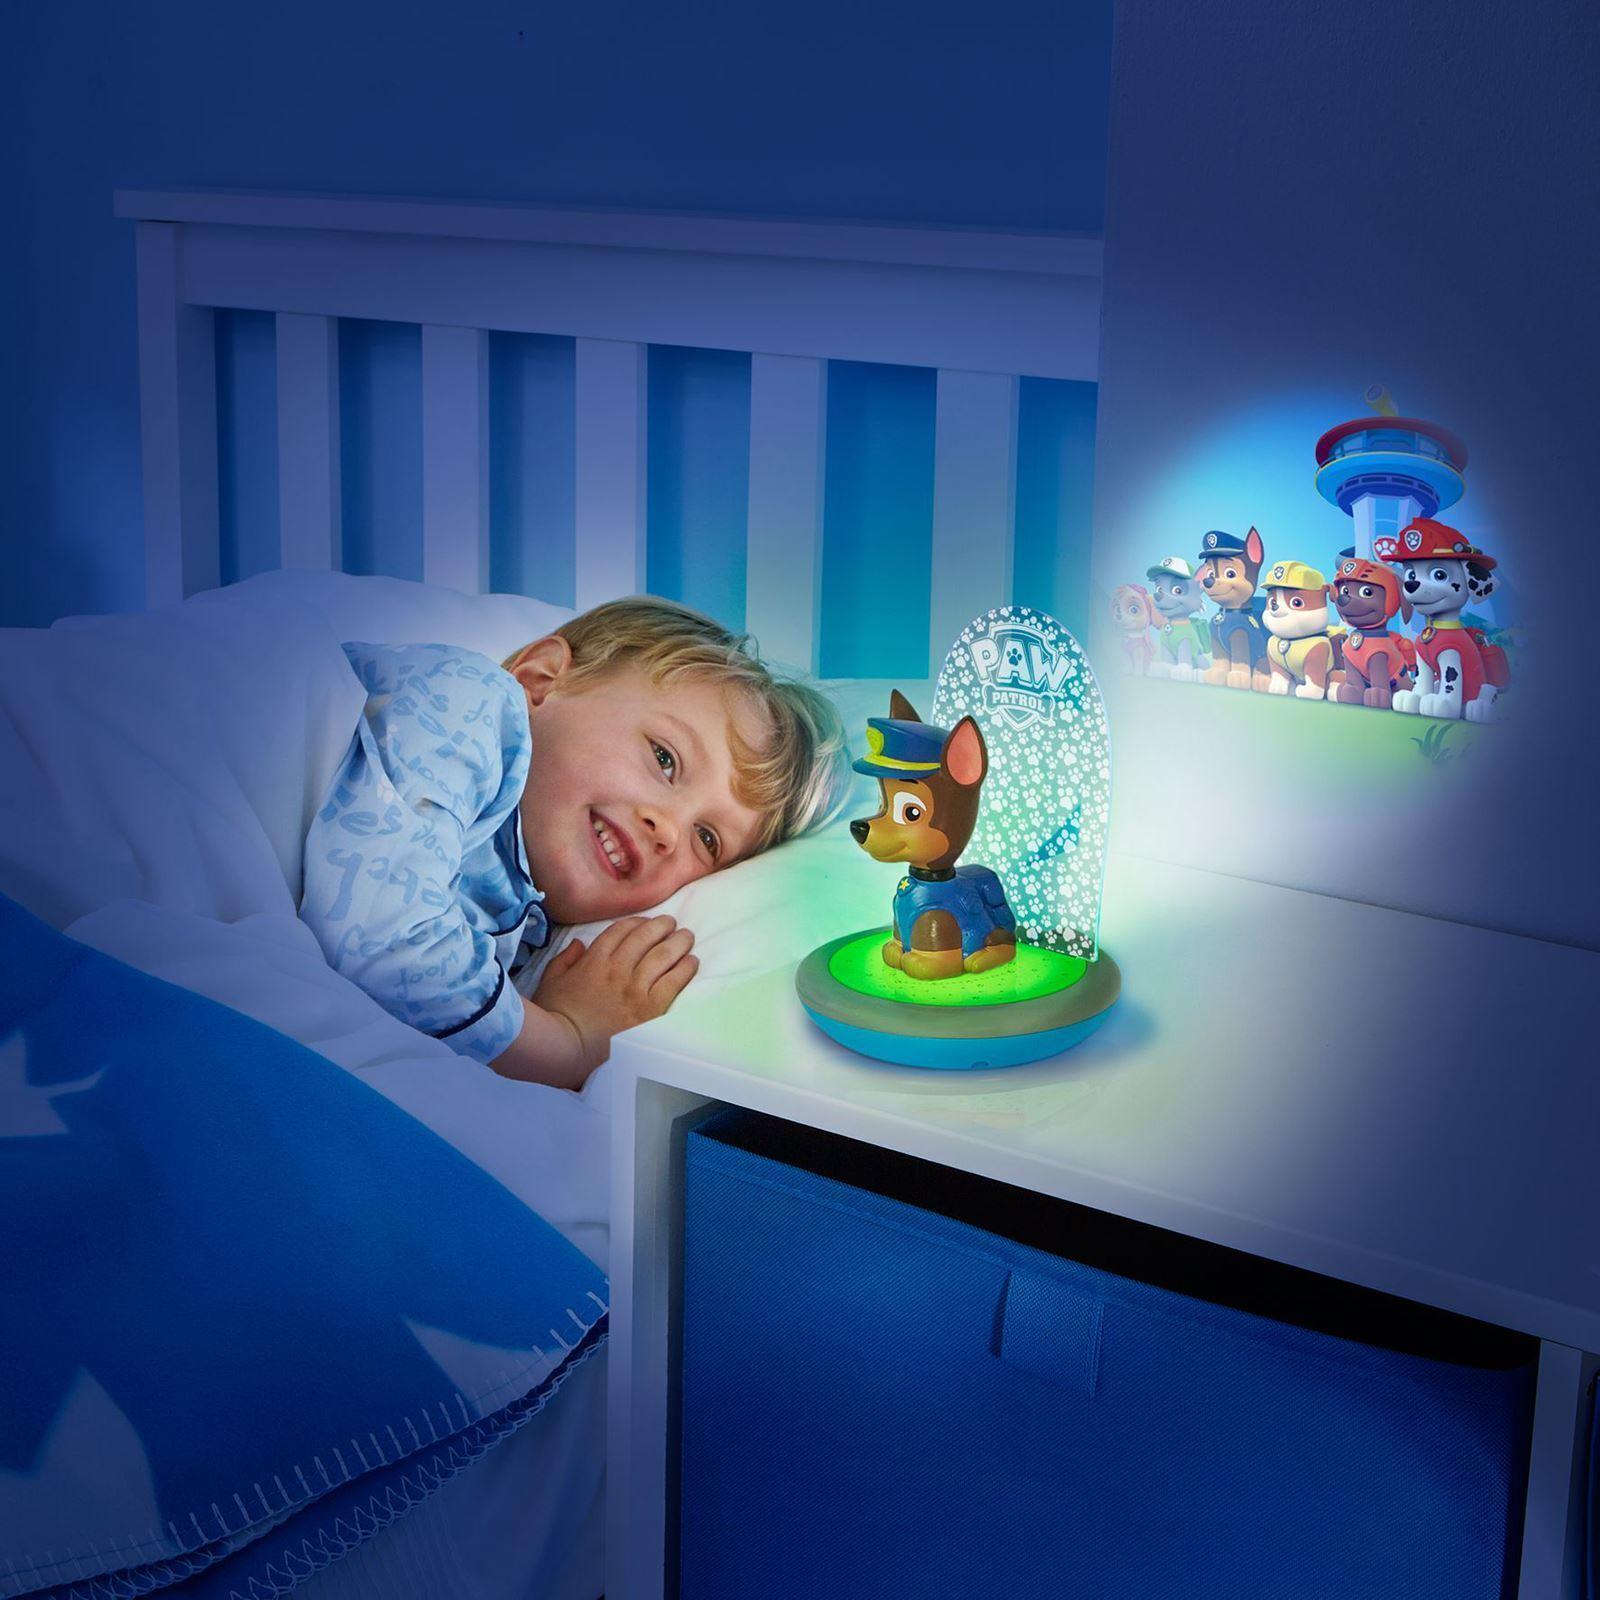 kids bedroom lights. Picture 1 of 6  Paw Patrol Kids Bedroom Lighting Illumi mate Lamp More 100